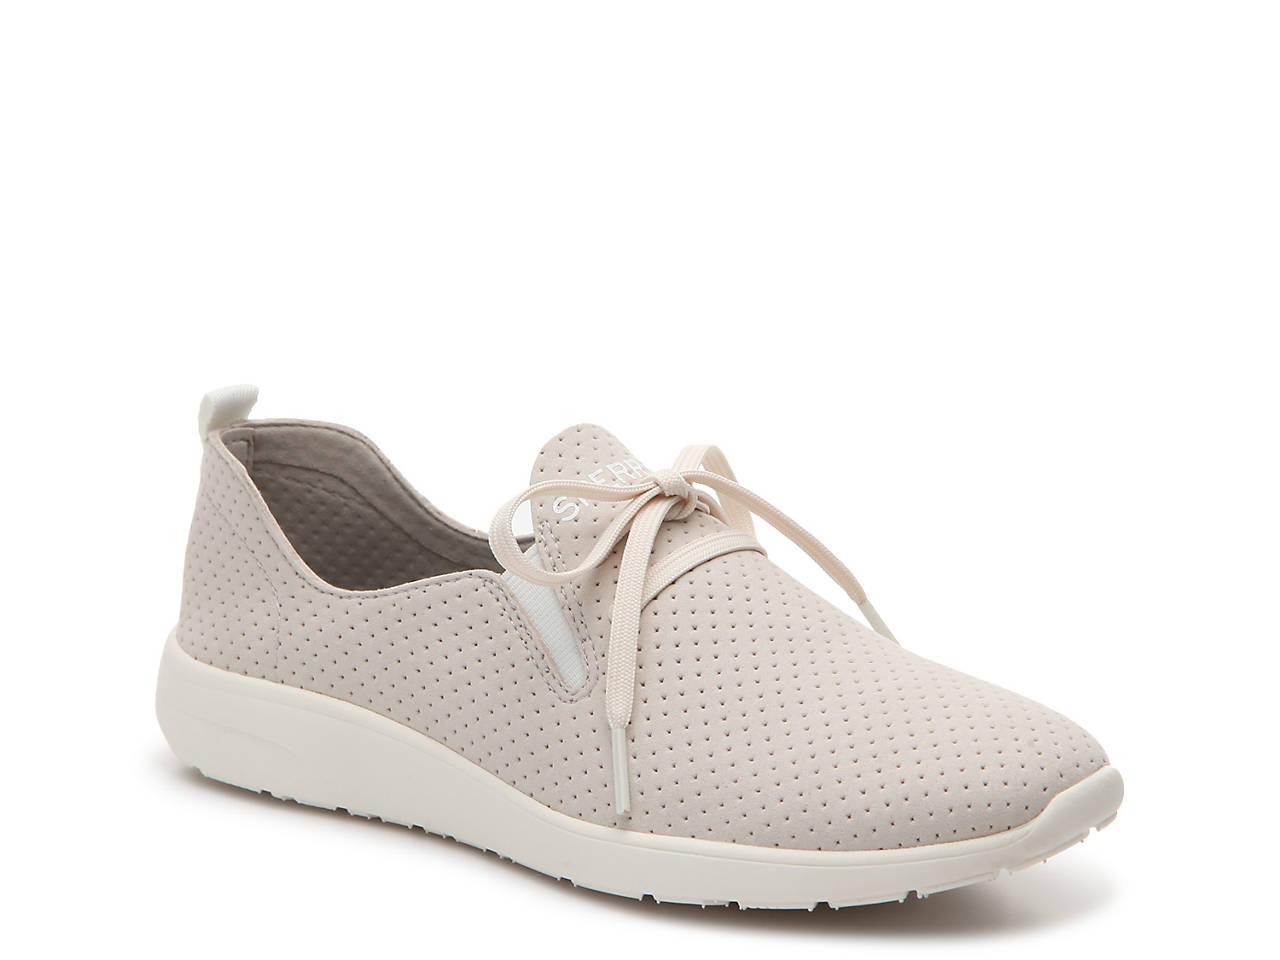 eeb1f929f48ac Sperry Top-Sider Rio Aqua Slip-On Sneaker Women s Shoes